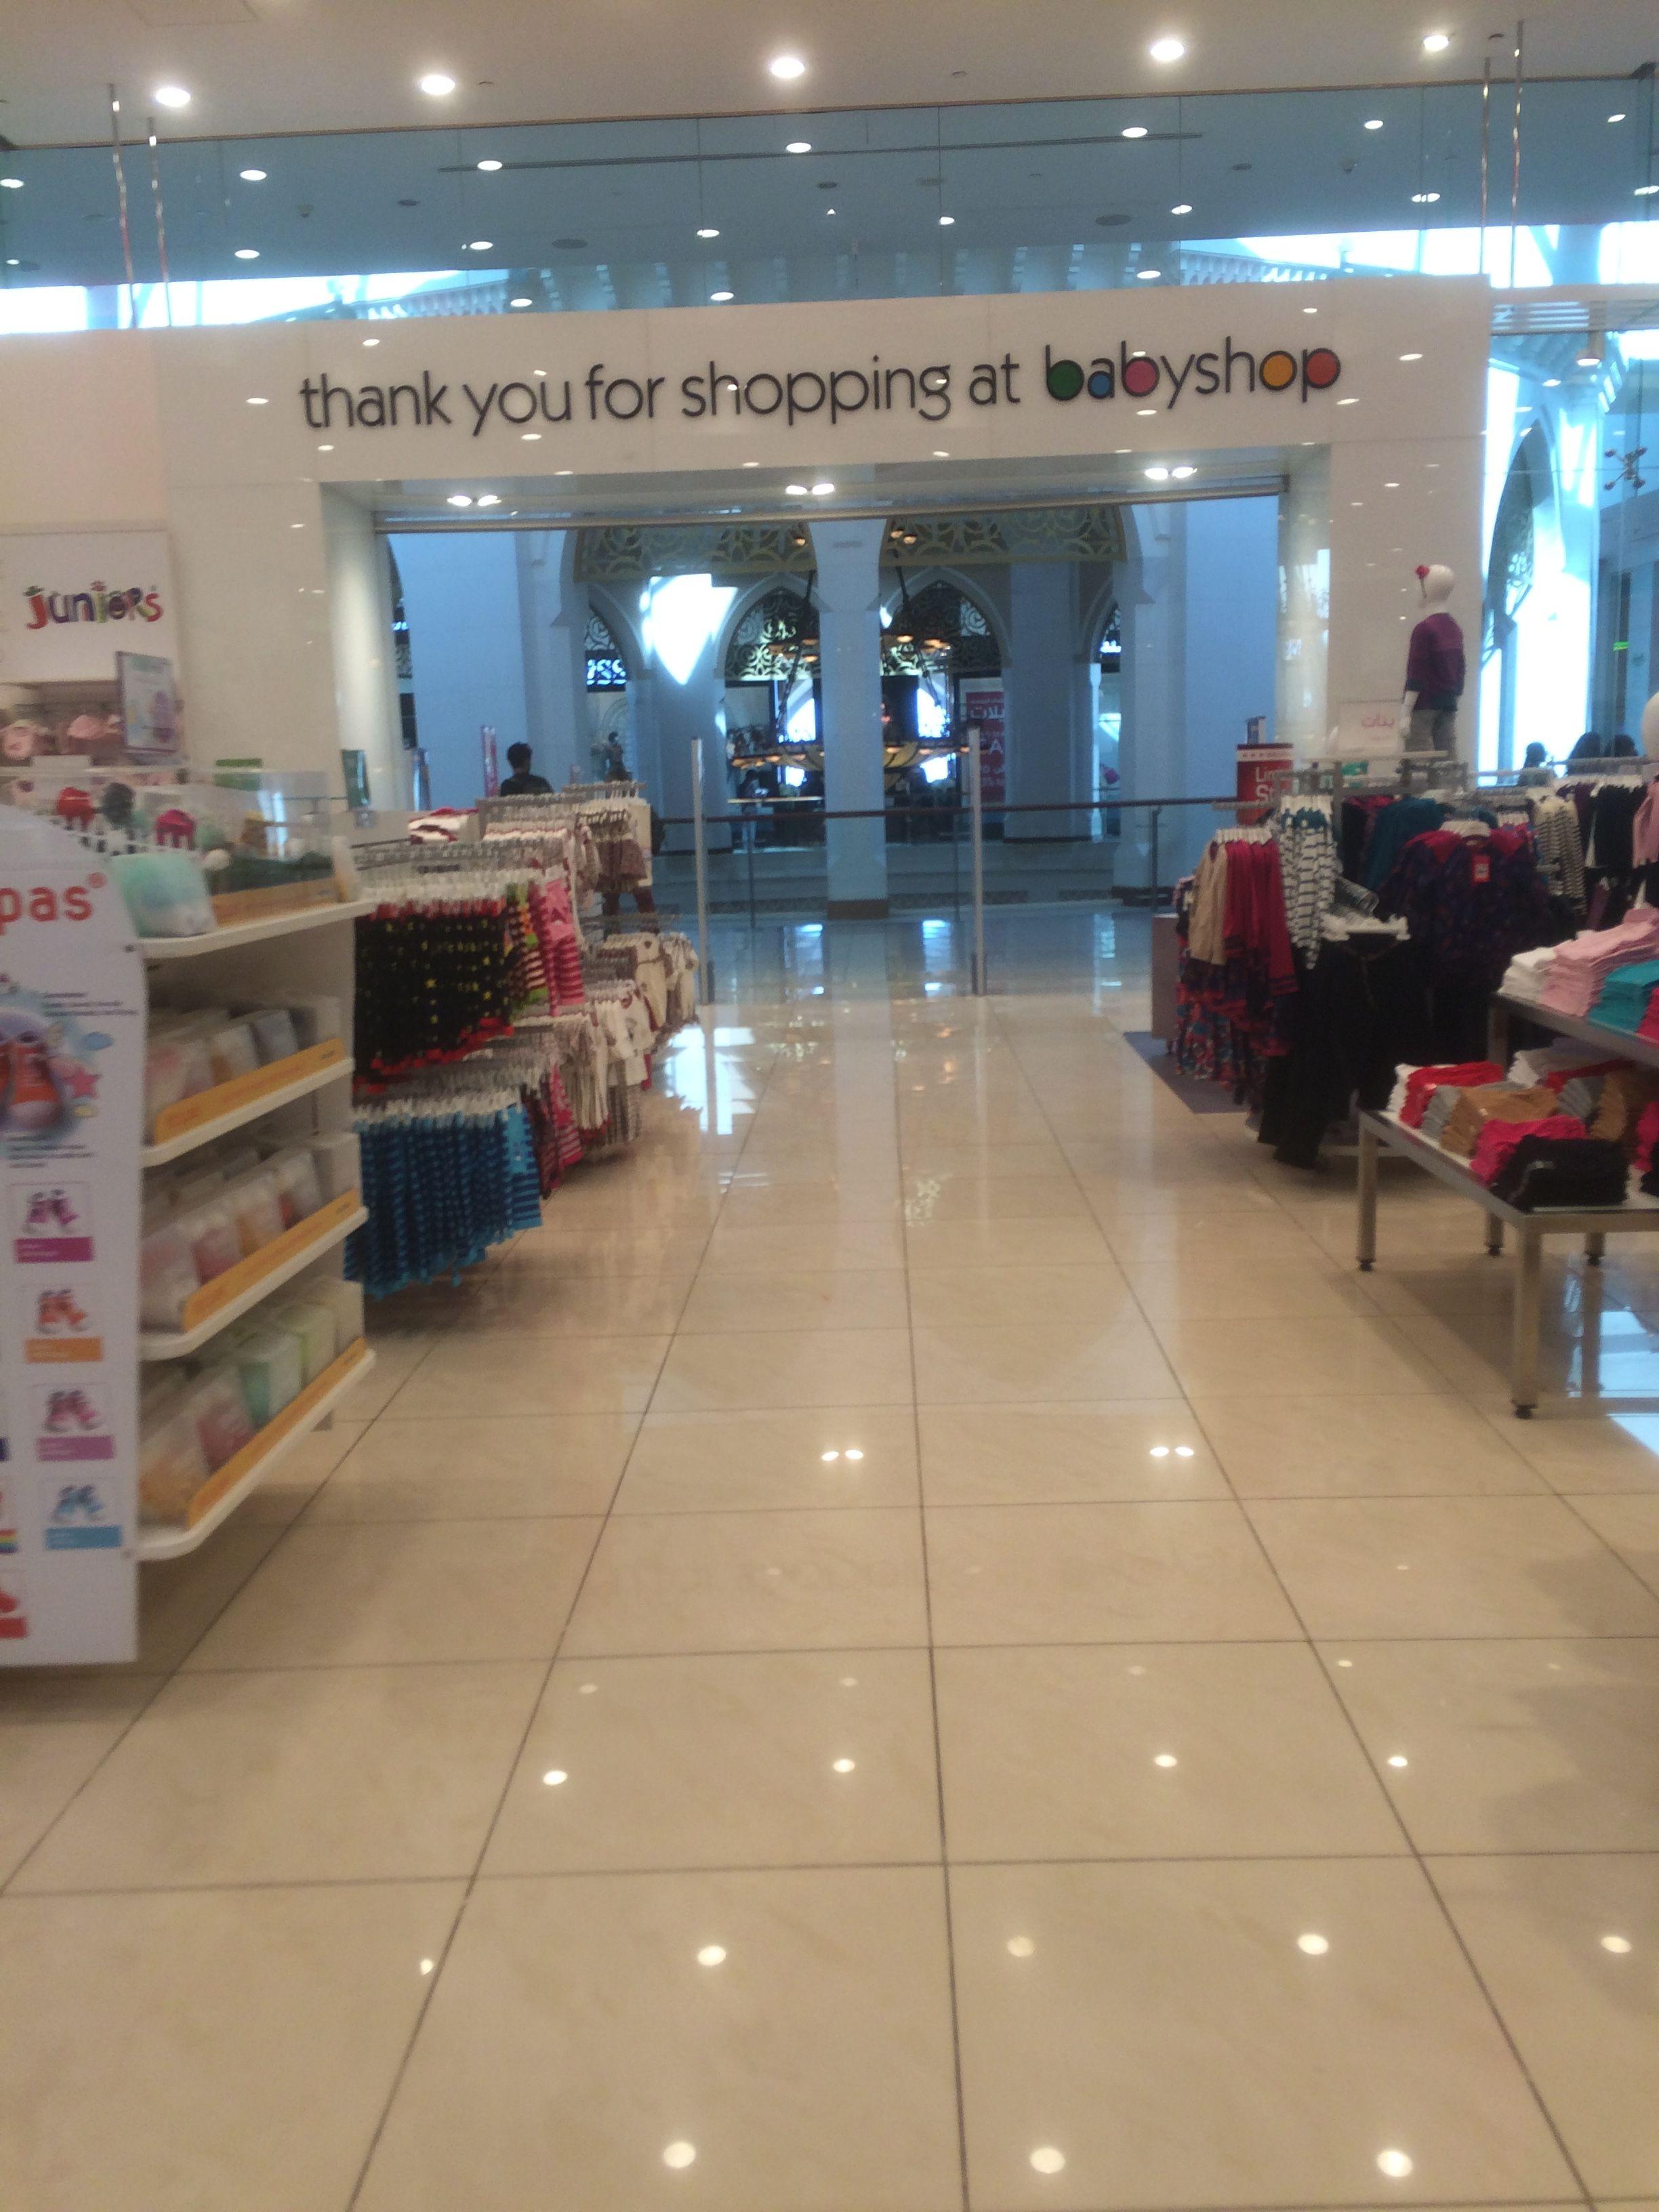 0d47bf919aaa9 Babyshop - UAE - Dubai Mall - Dubai - Baby - Toys - Clothes - Visual  Merchandising - Layout - Landscape - www.clearretailgroup.eu